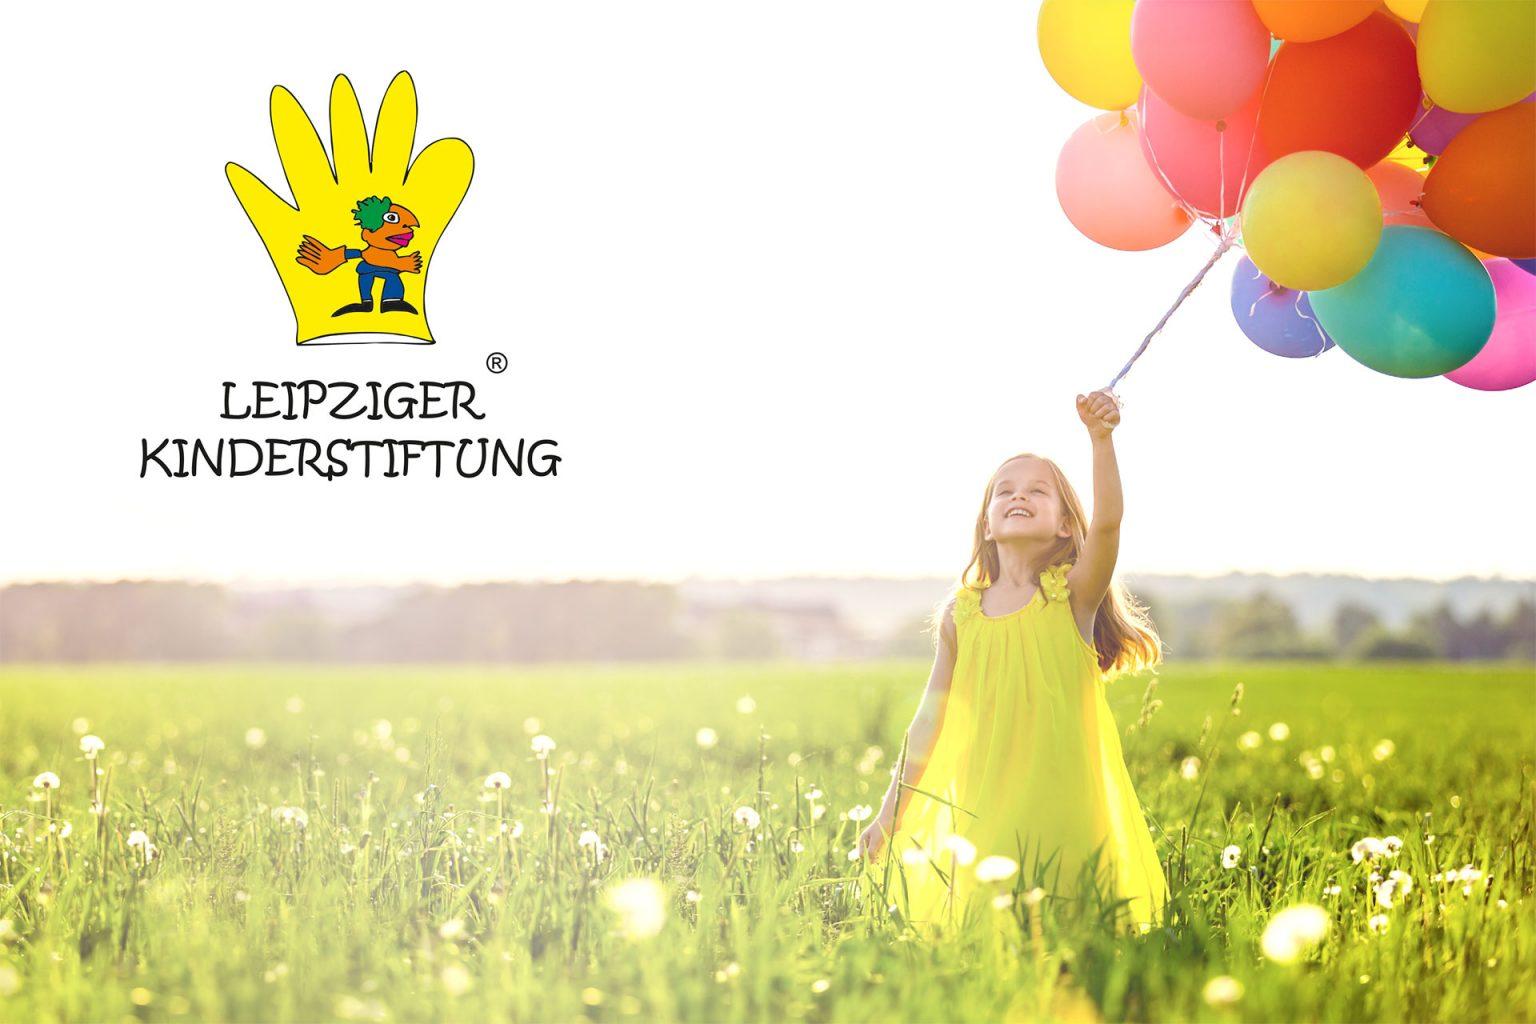 Leipziger Kinderstiftung - Alexander Malios